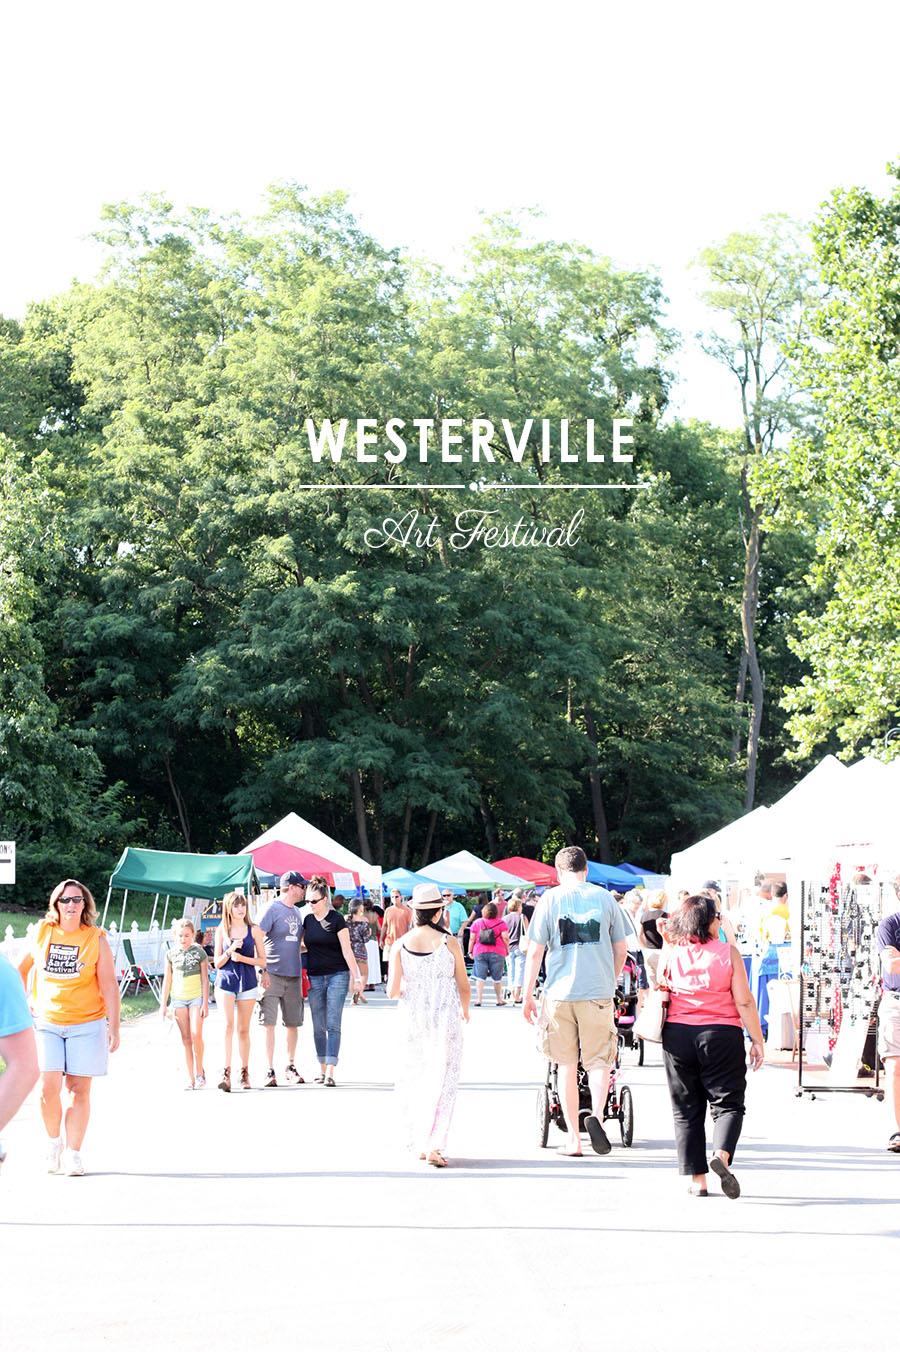 westerville2.jpg